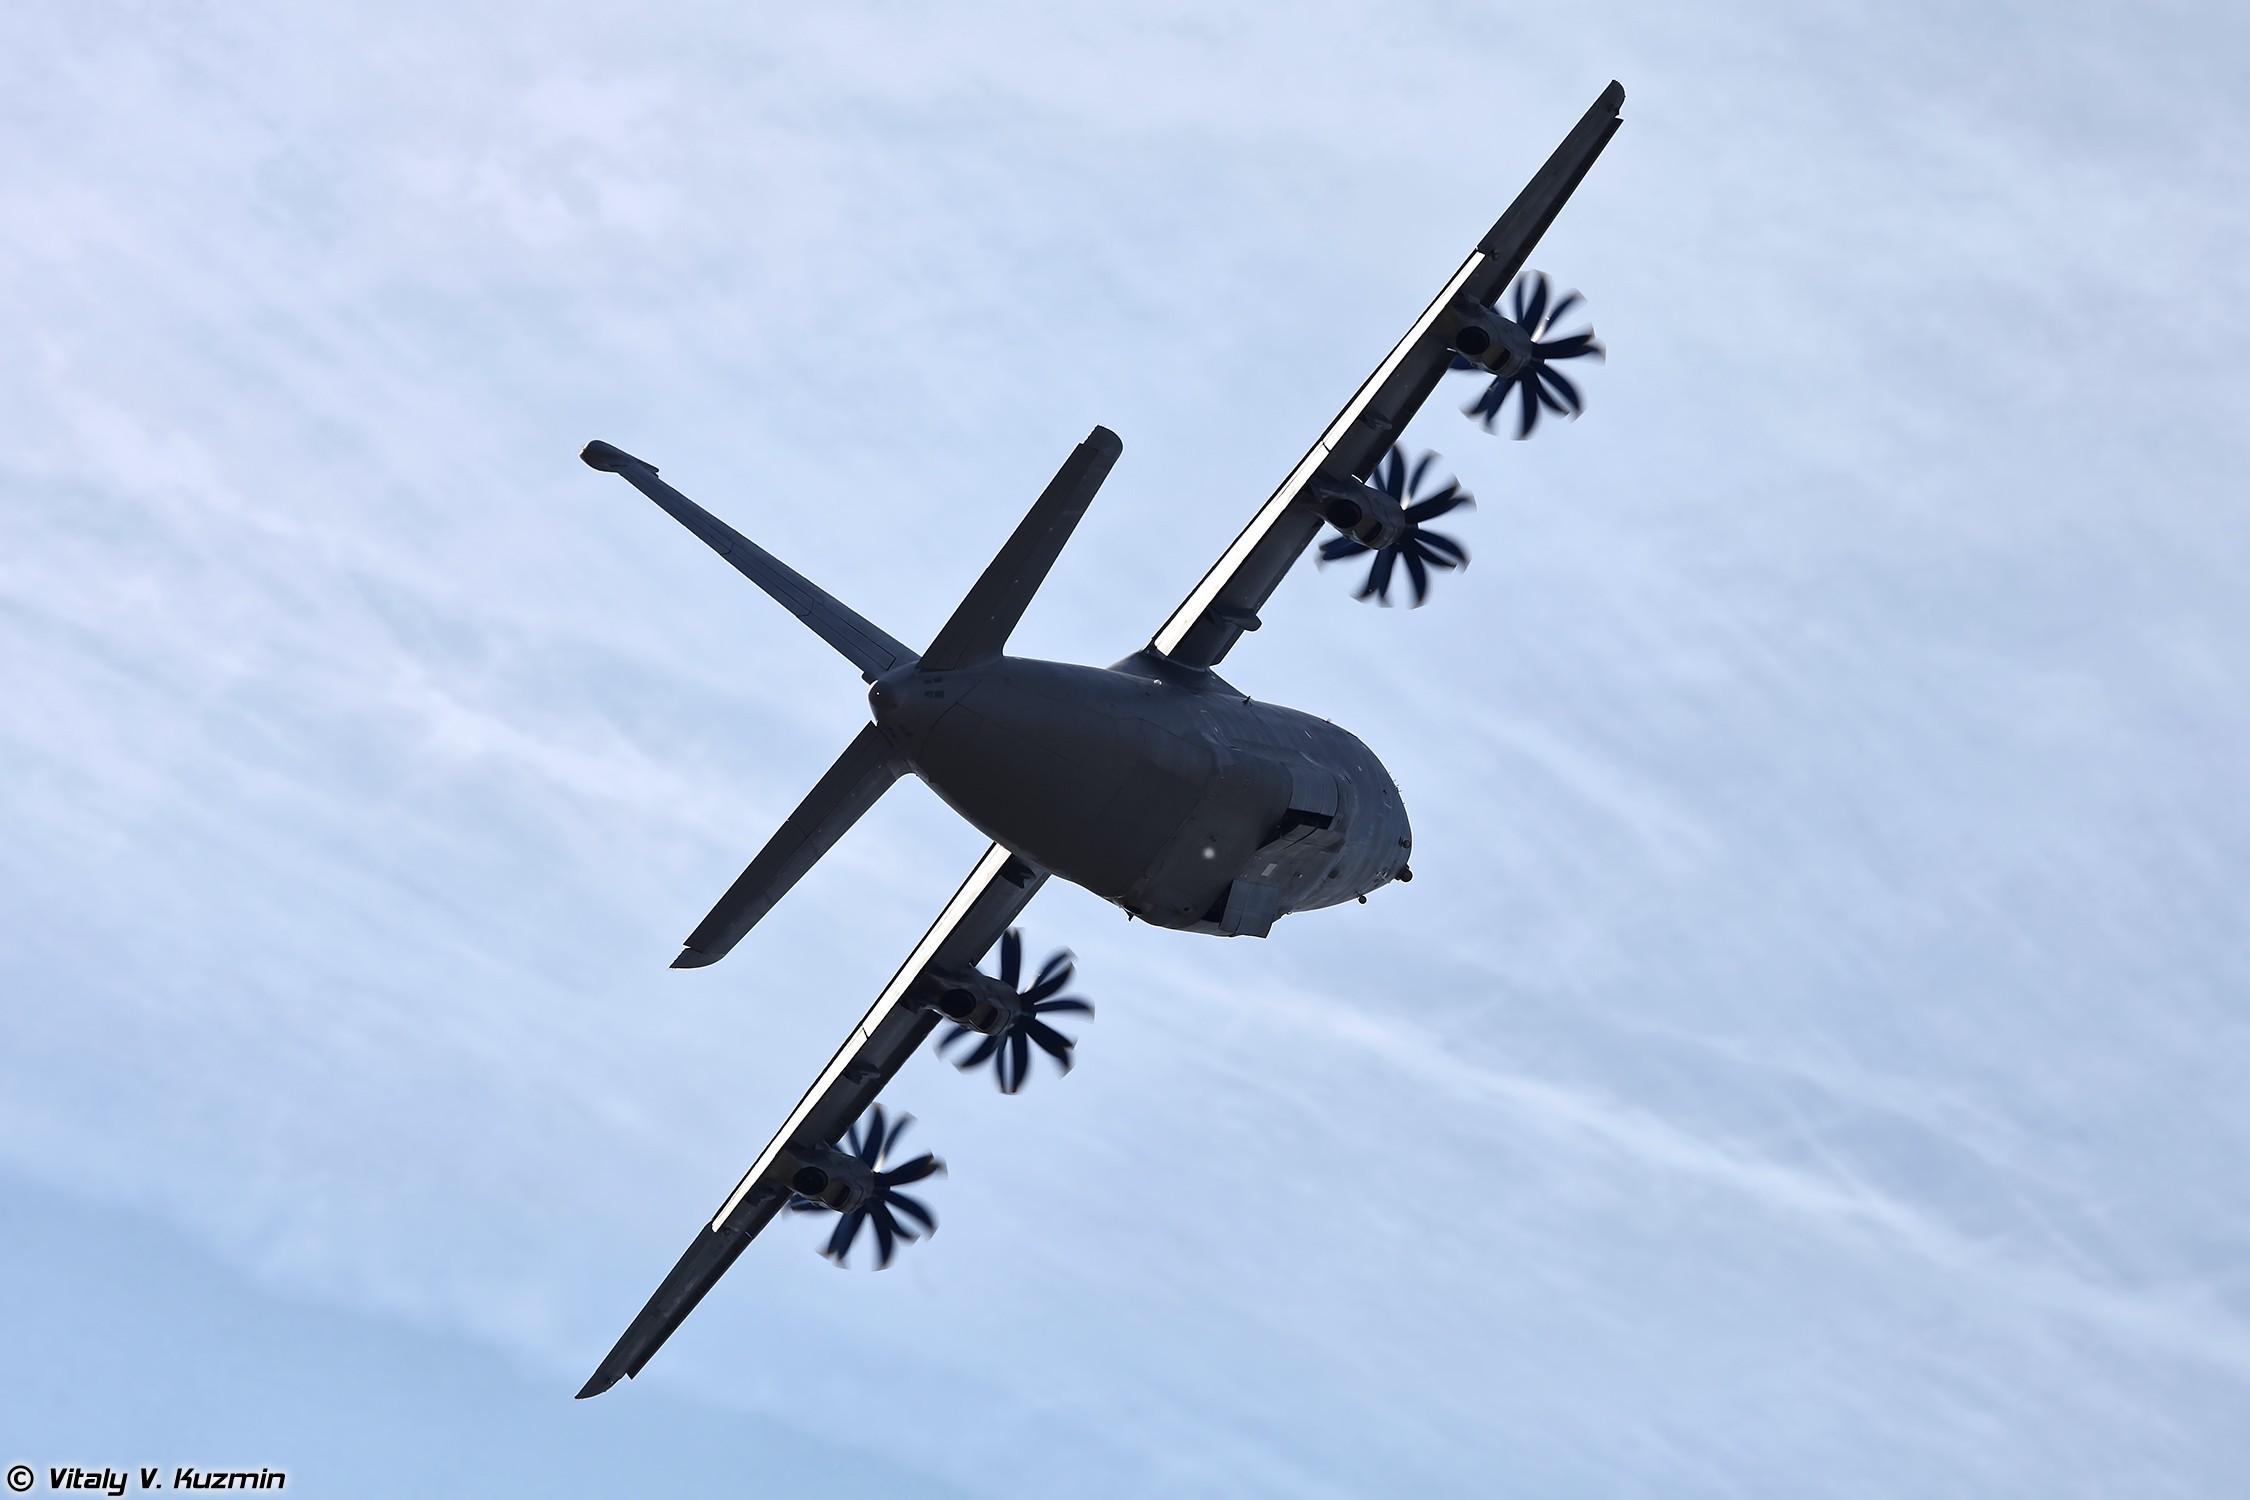 General 2250x1500 military aircraft Antonov An-70 aircraft military military vehicle vehicle warplanes